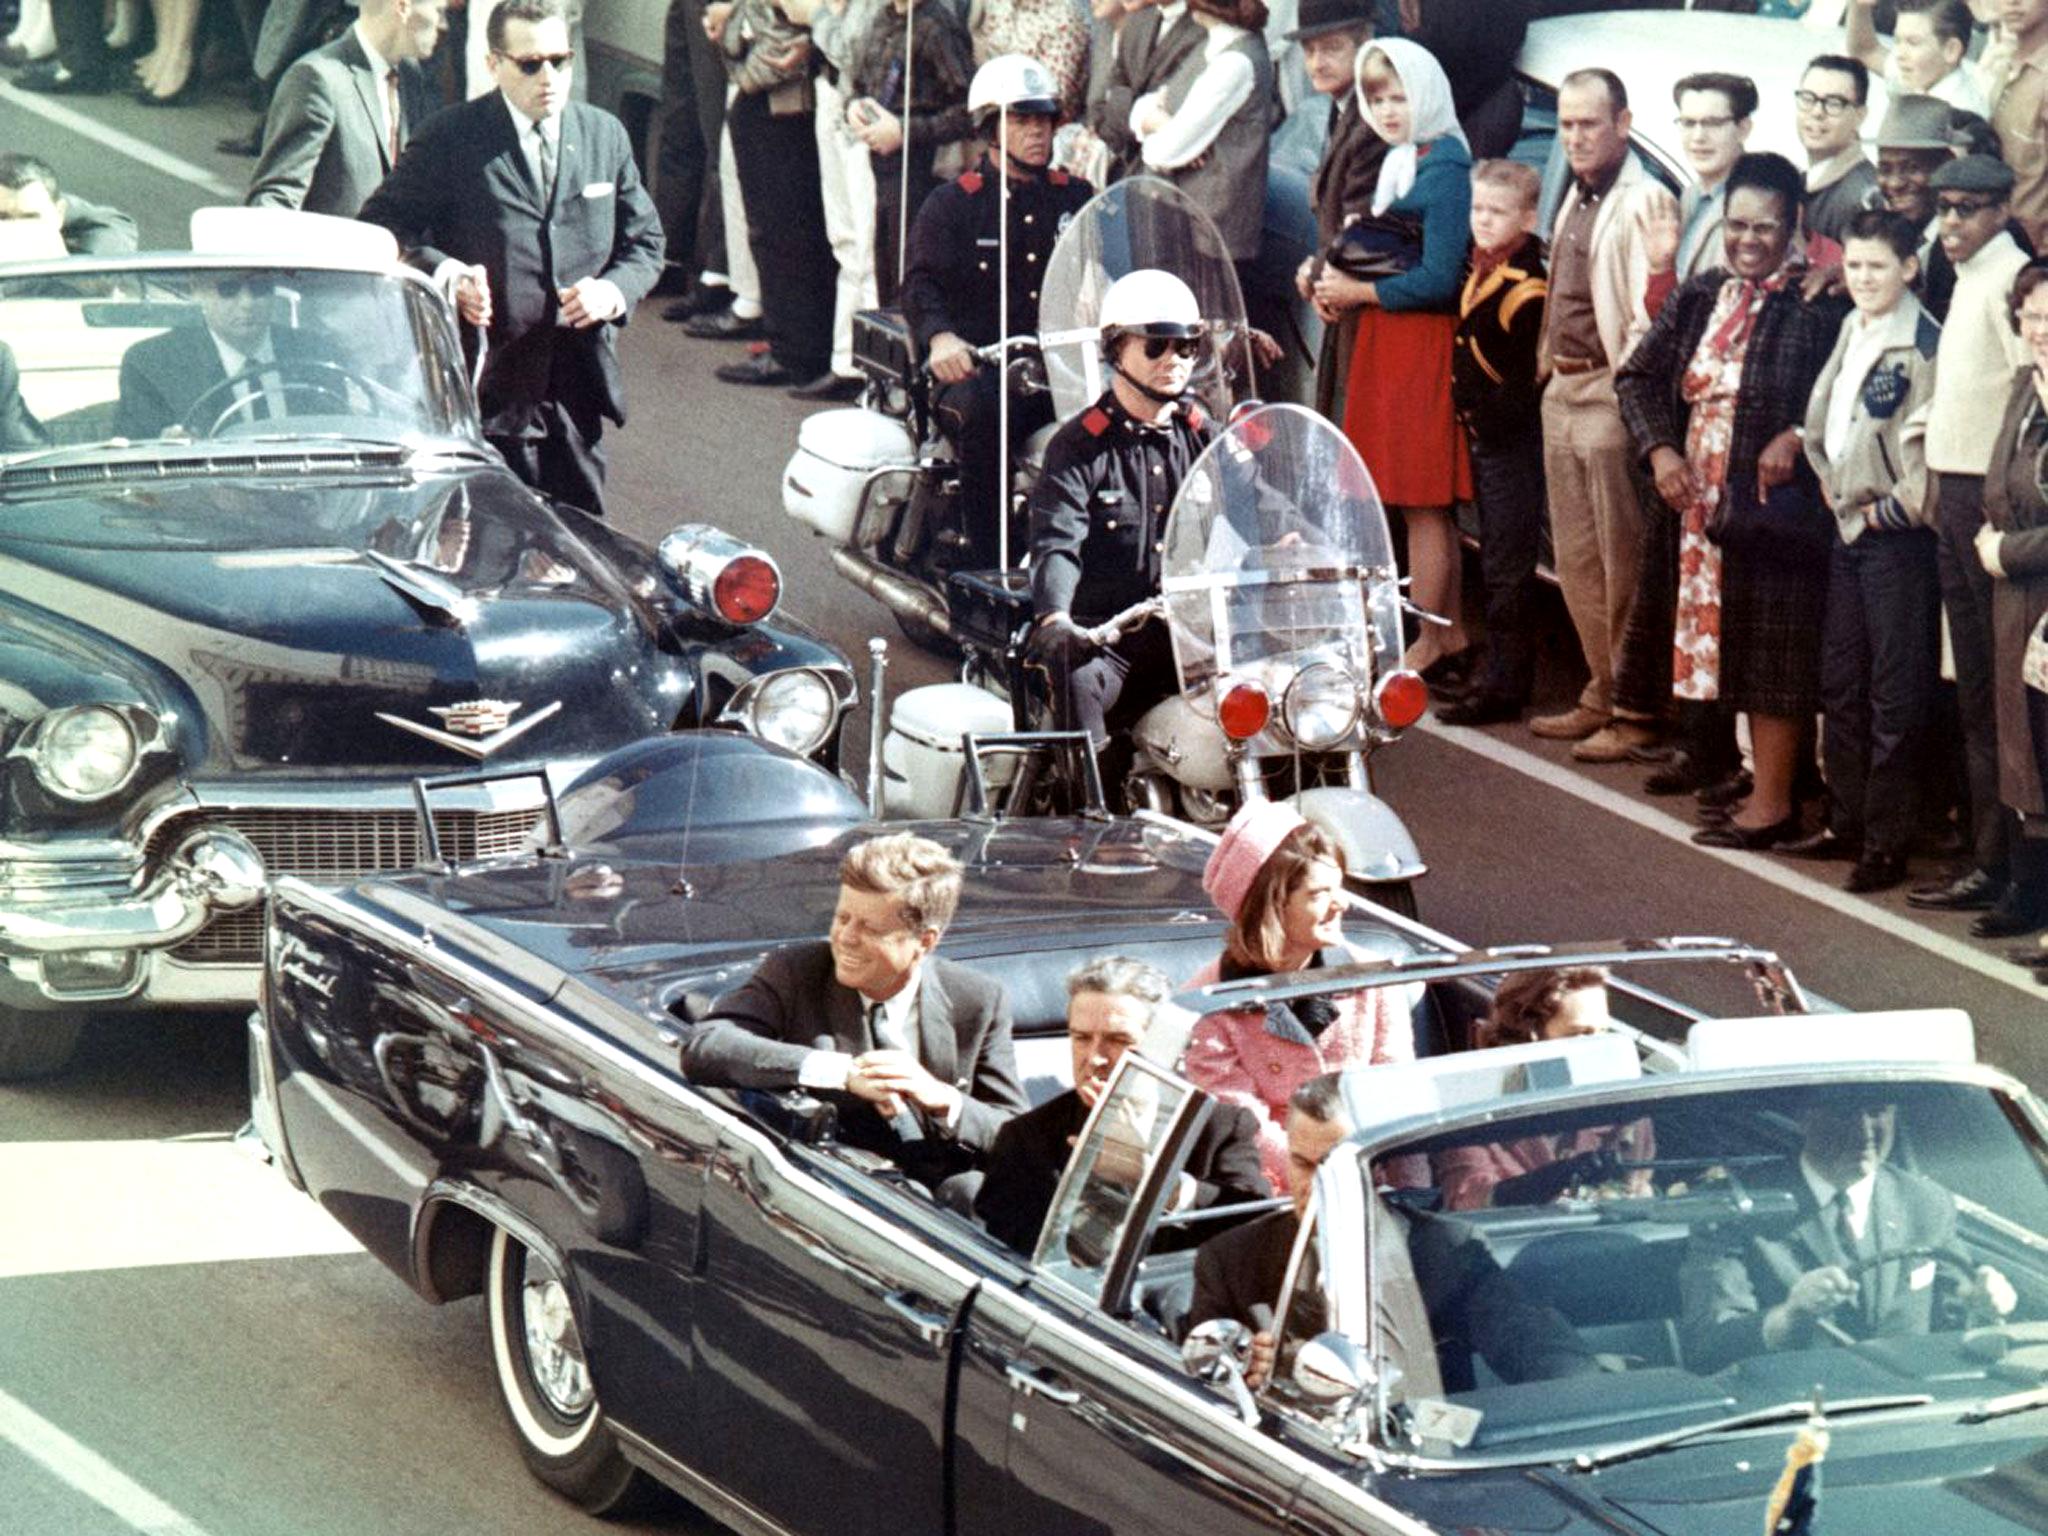 John F. Kennedy, sua esposa (Jacqueline) e o governador do Texas, John Connally, na limusine presidencial, minutos antes do assassinato